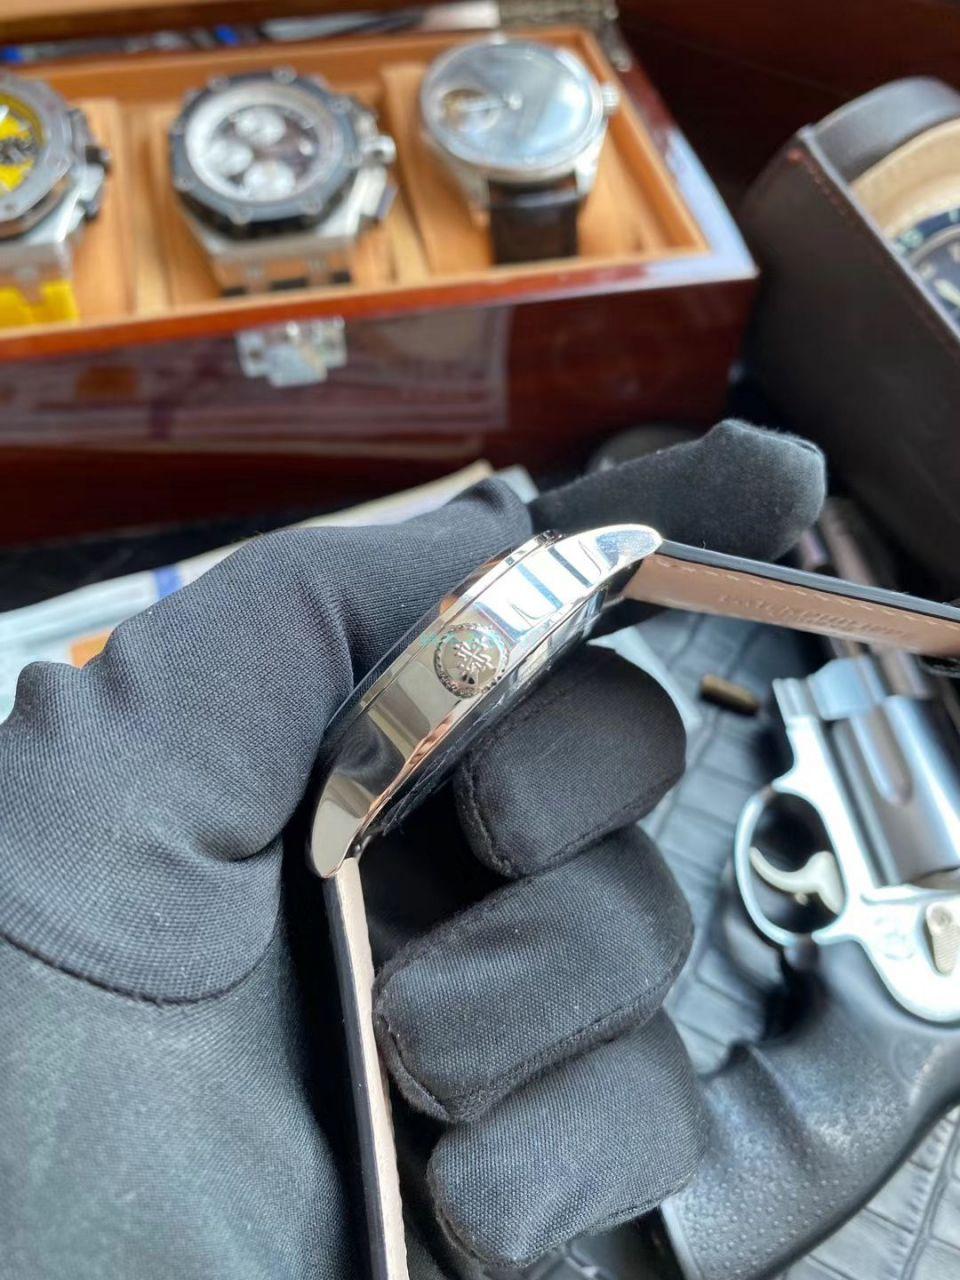 GR厂PP复刻手表百达翡丽复杂功能时计系列5524R-001腕表